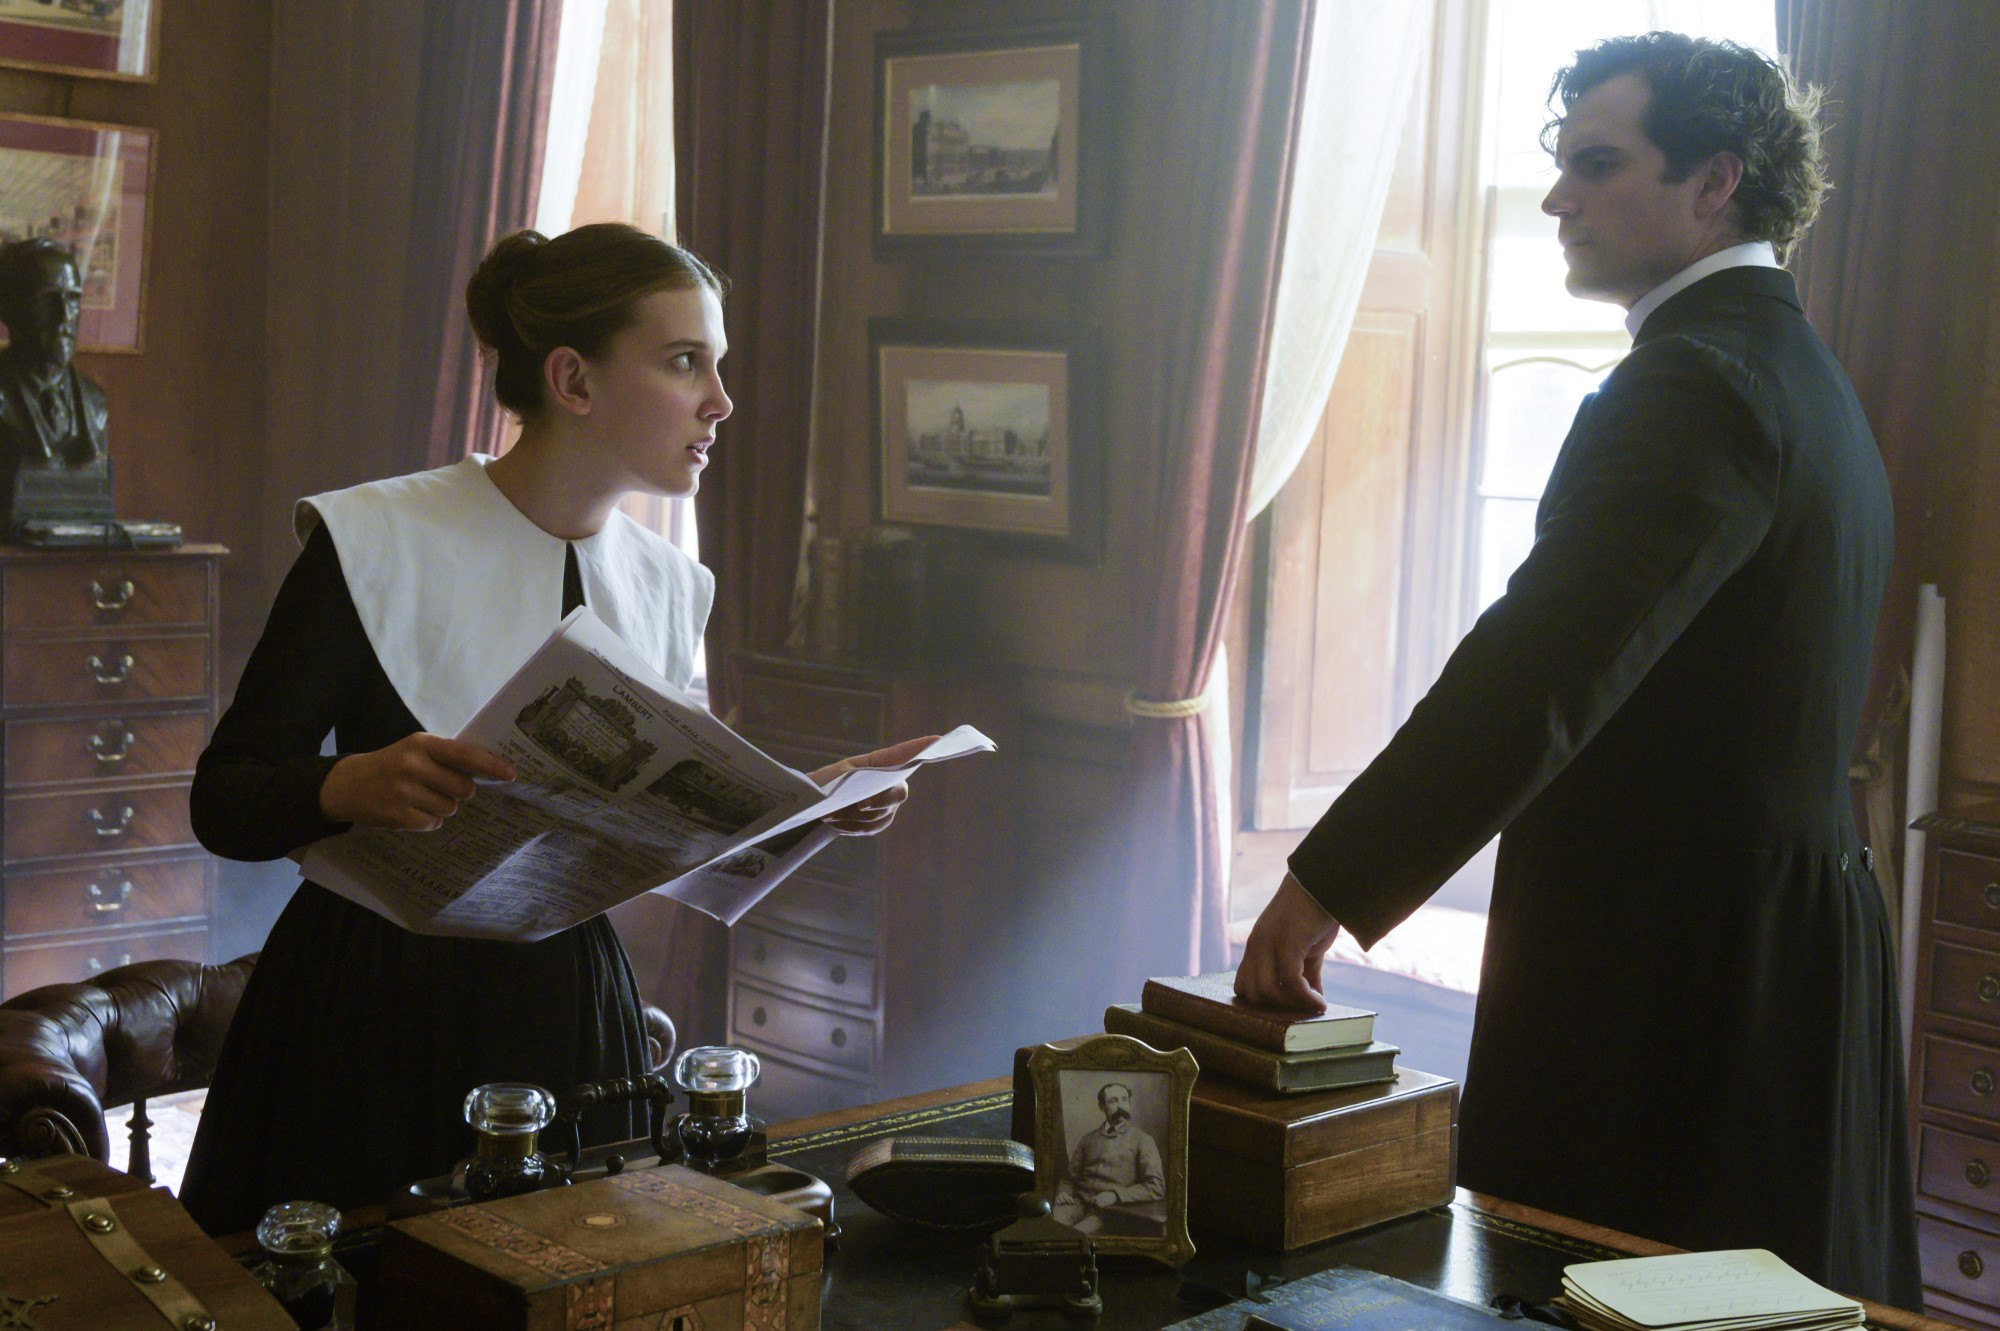 Netflix September slate: Tom Holland's The Devil All the Time, Millie Bobby Brown's Enola Holmes, & more 12